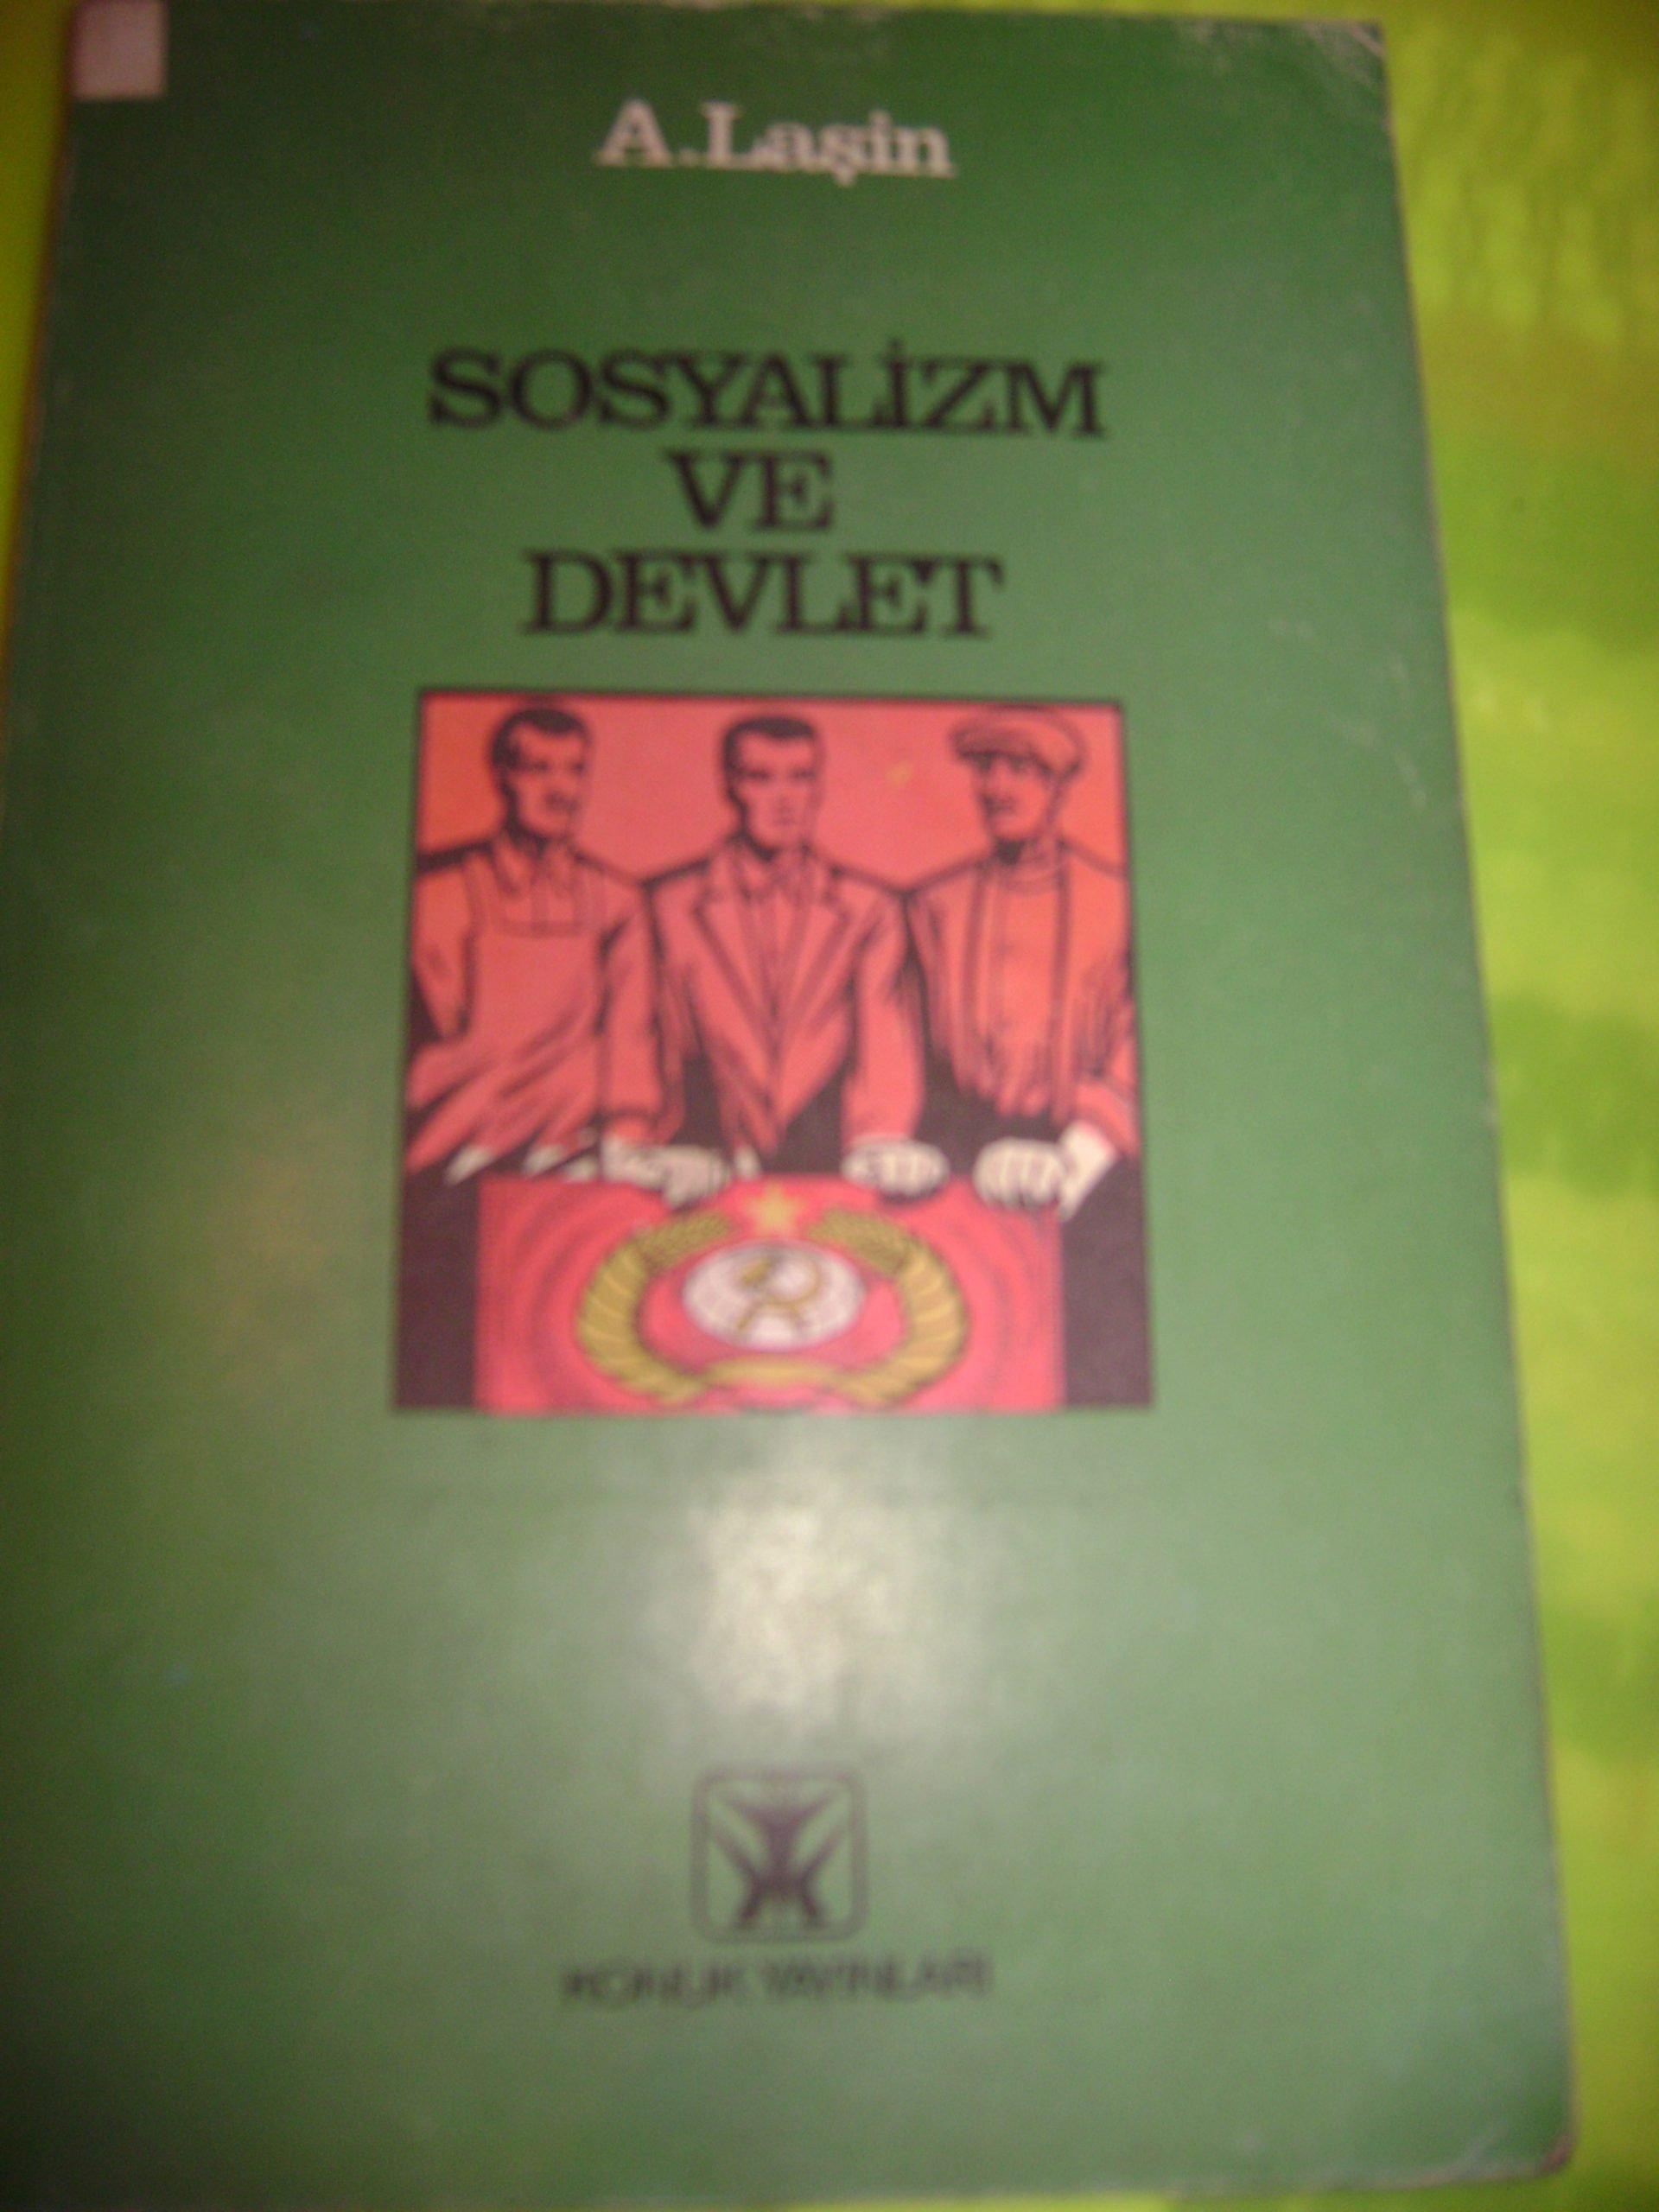 SOSYALİZM VE DEVLET/A.Laşin/15 tl